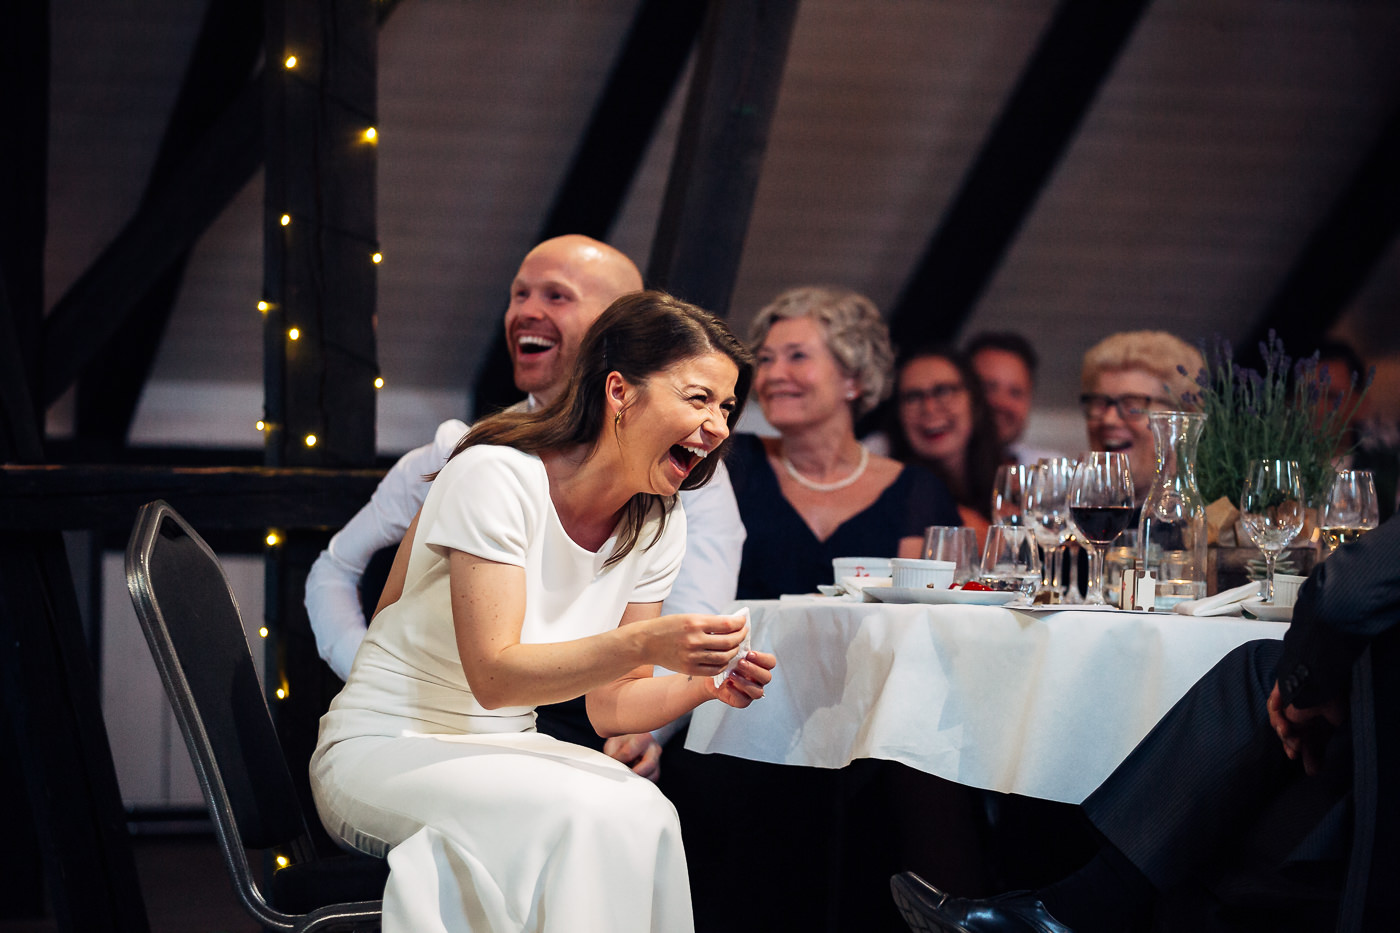 Malene & Ole Martin - elegant dansk- norskt bryllup i Oslo Bryllup Gamle Aker Oslo 14 Akershus